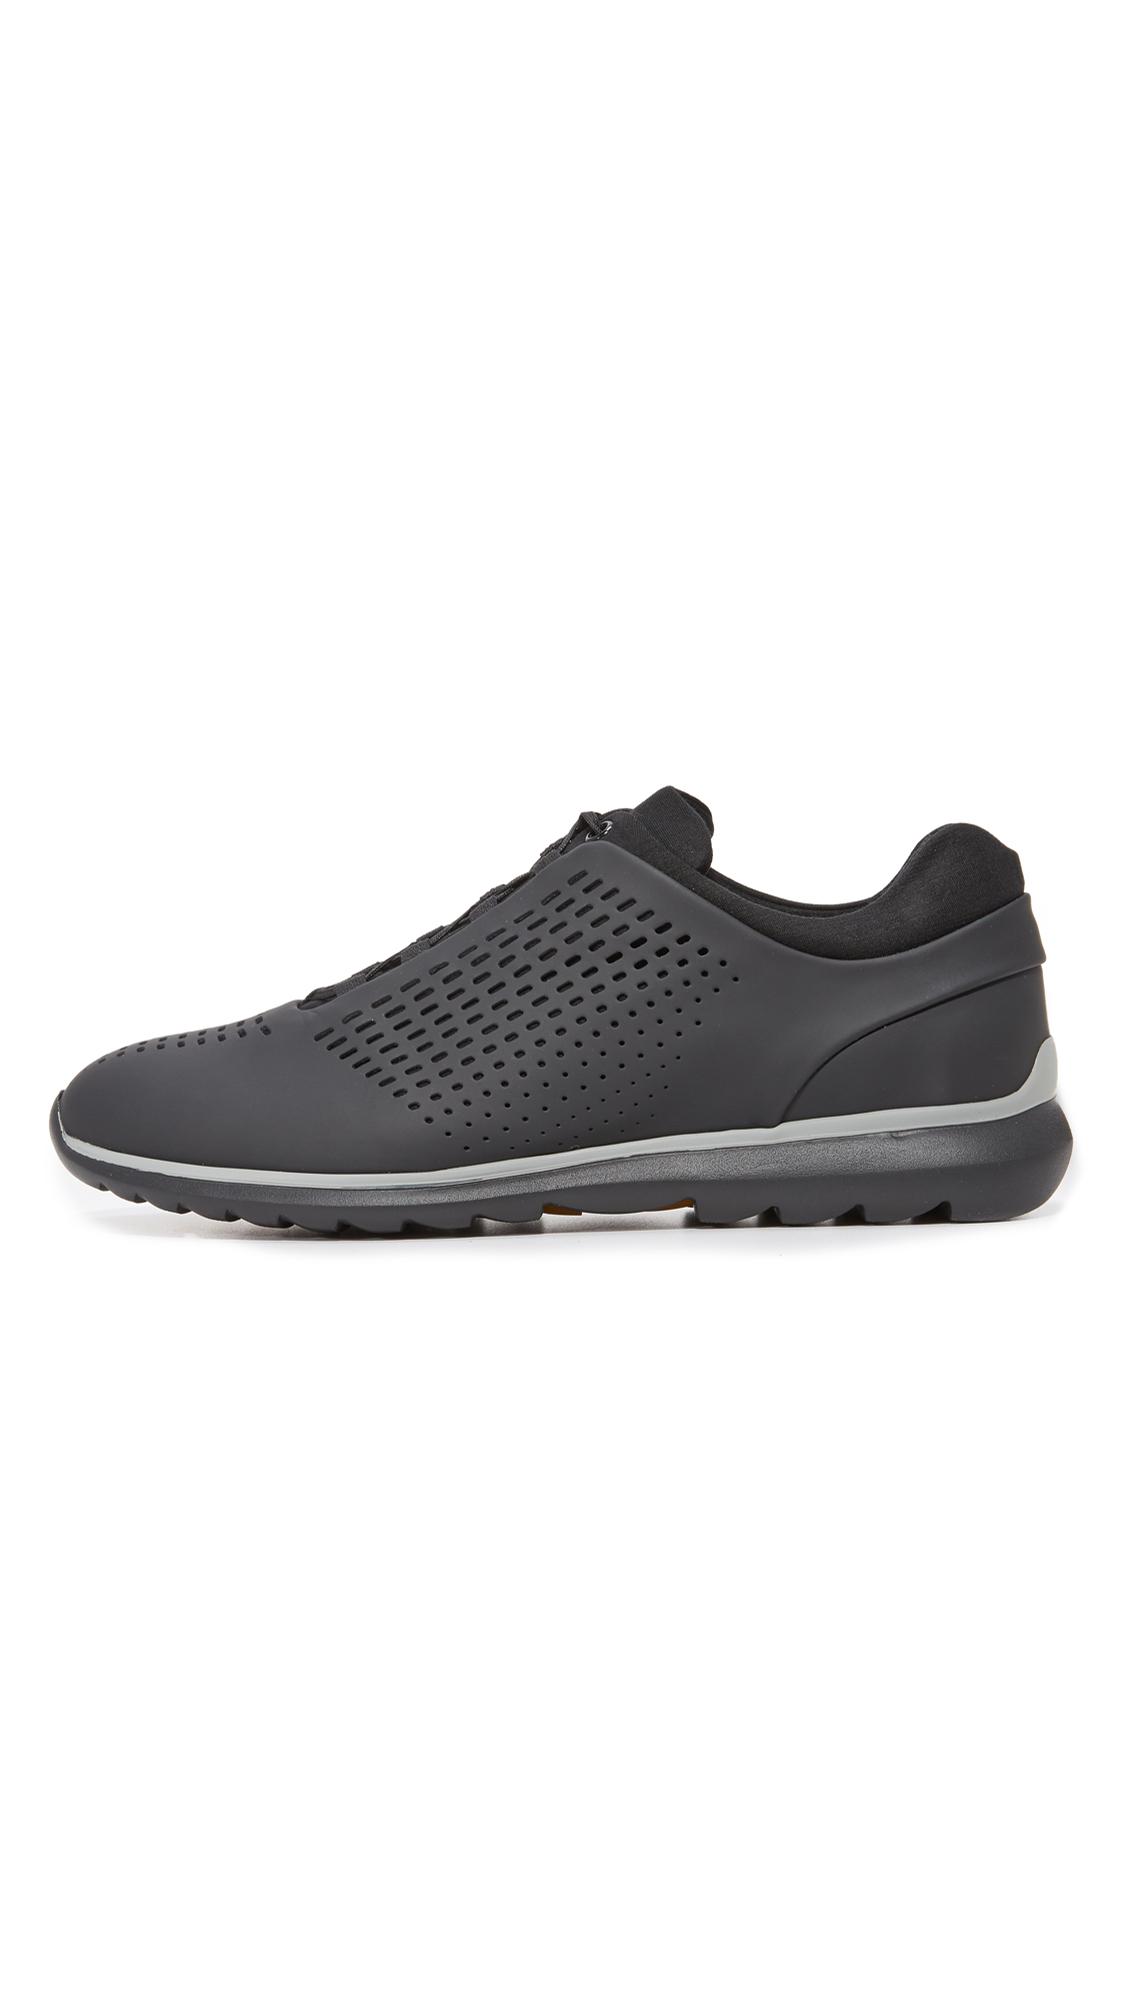 7411fee605 Z Zegna Sprinter Sneakers